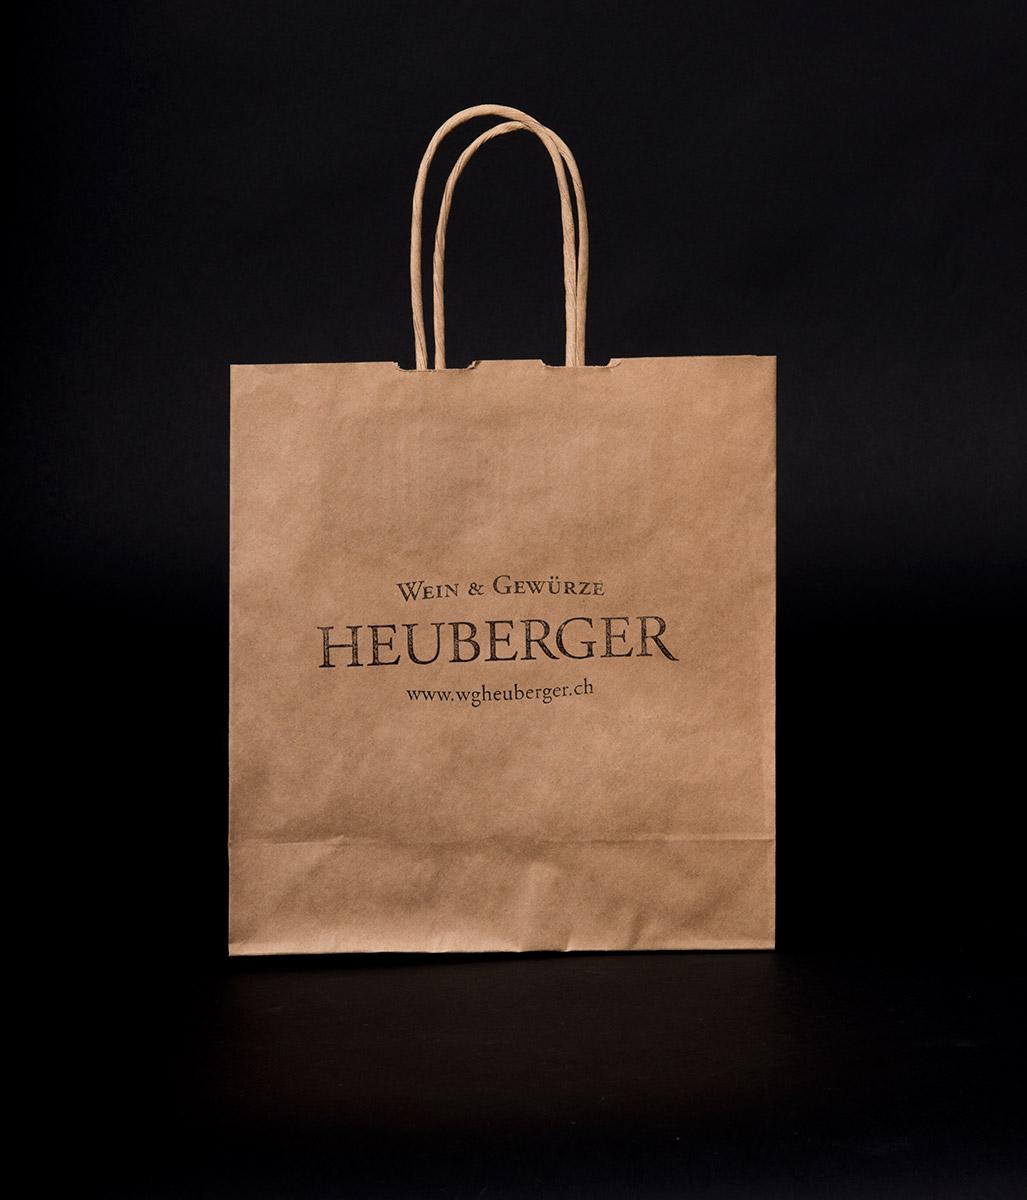 heuberger-02